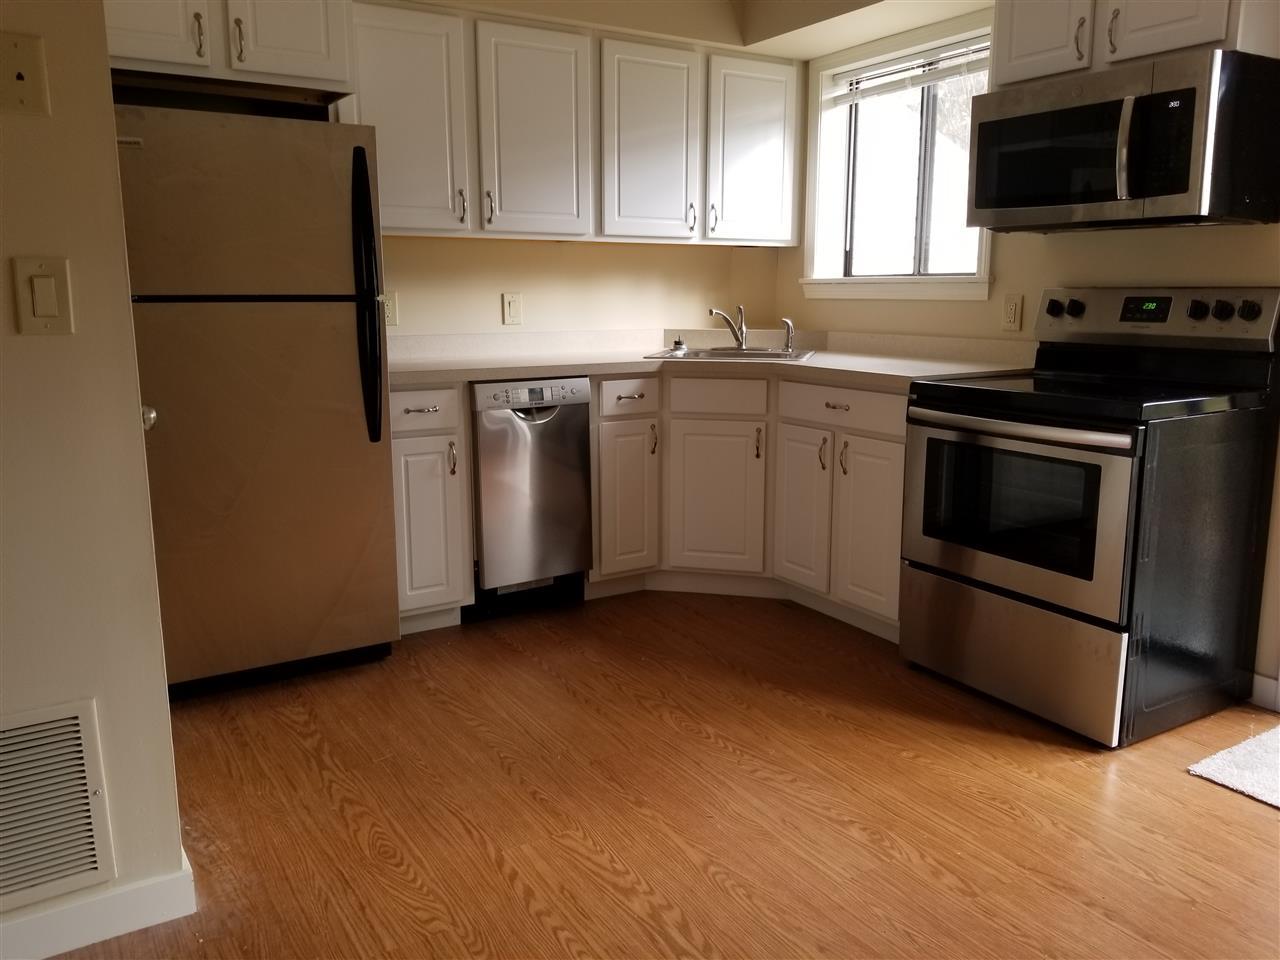 Kitchen, new appliances